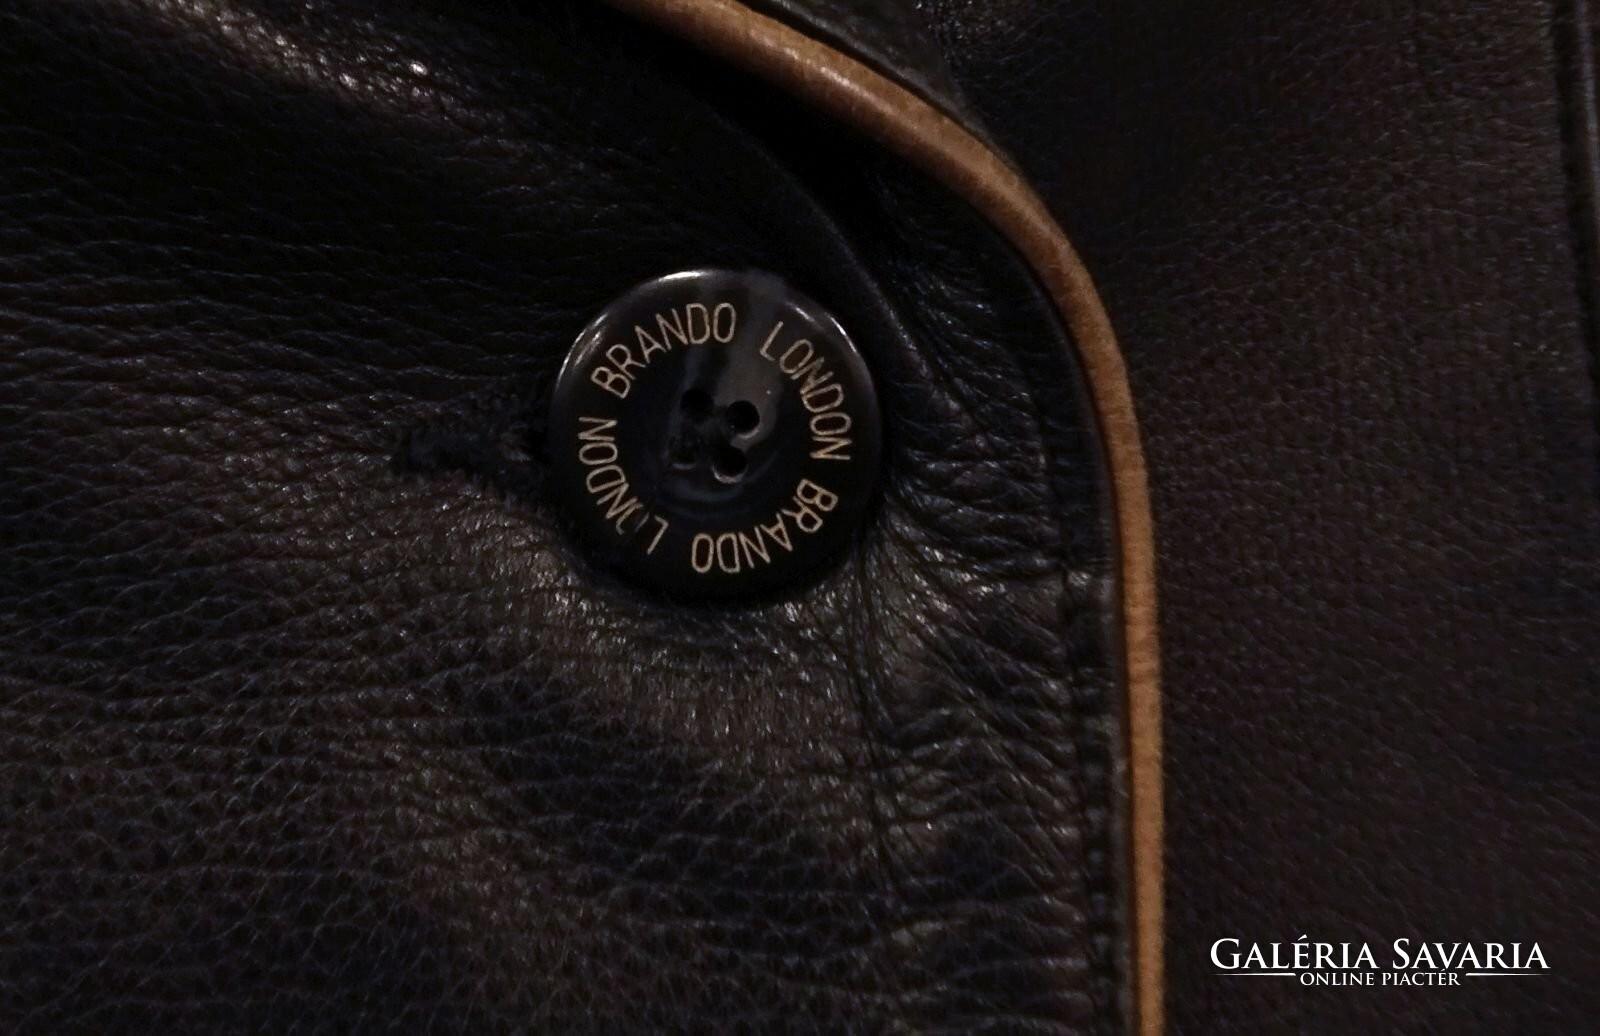 0U261 Régi Brando fekete női bőrkabát Gardrób   Galéria